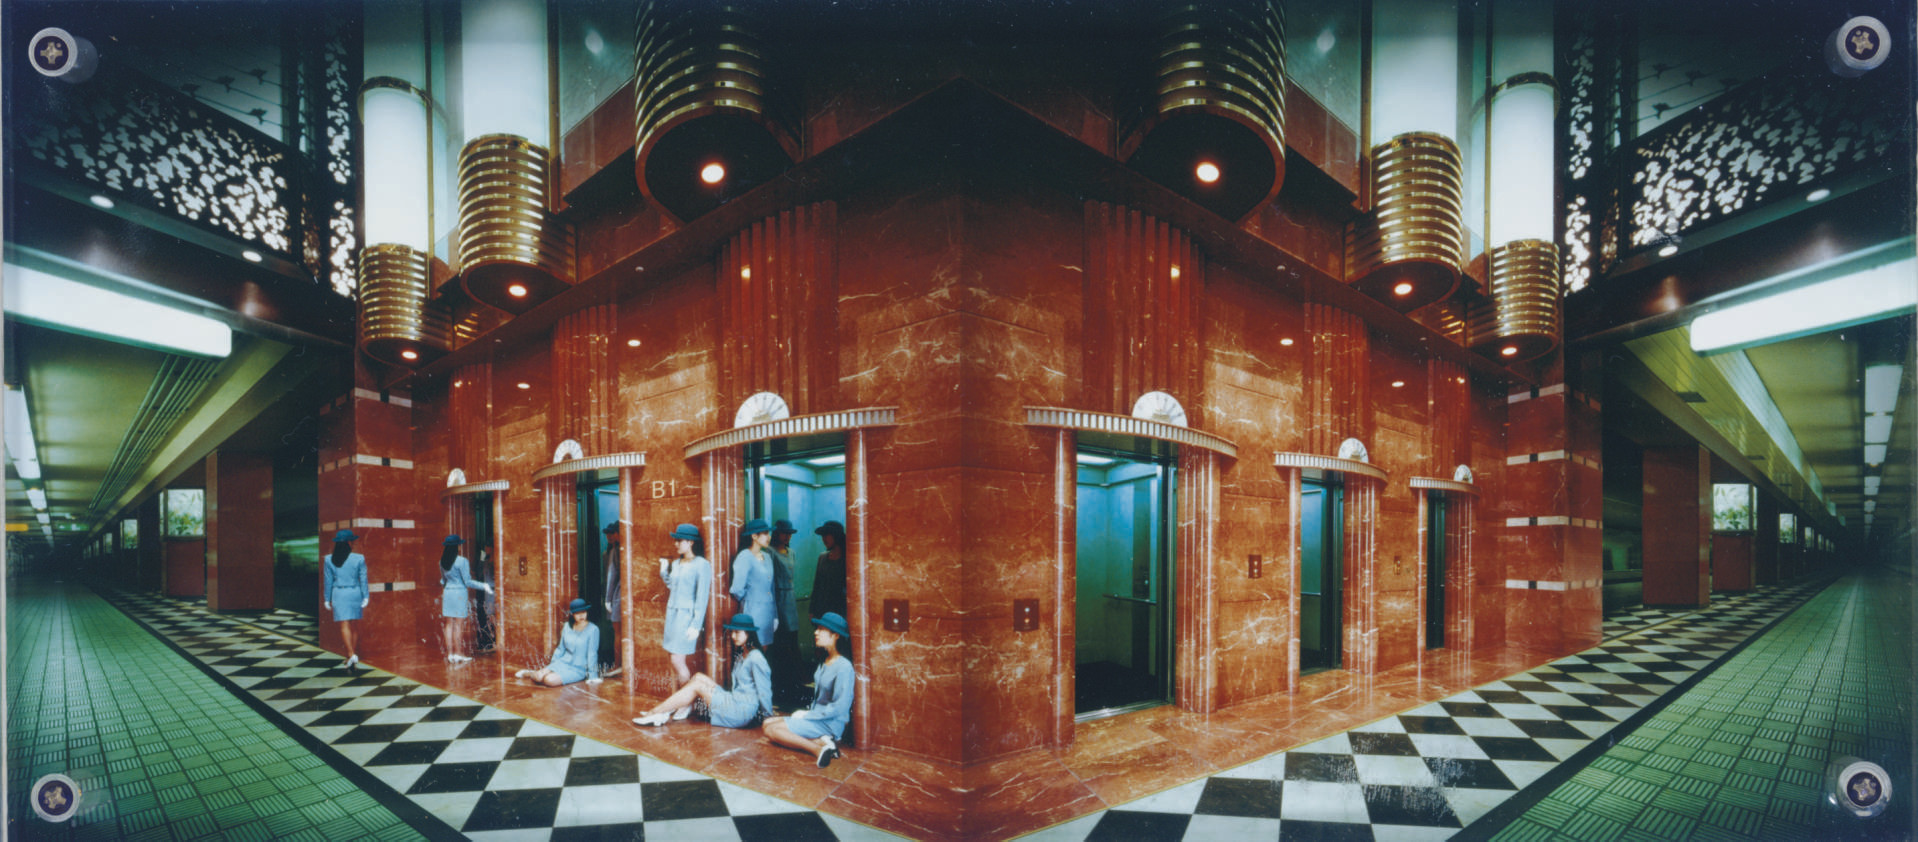 Elevator Girl House B1